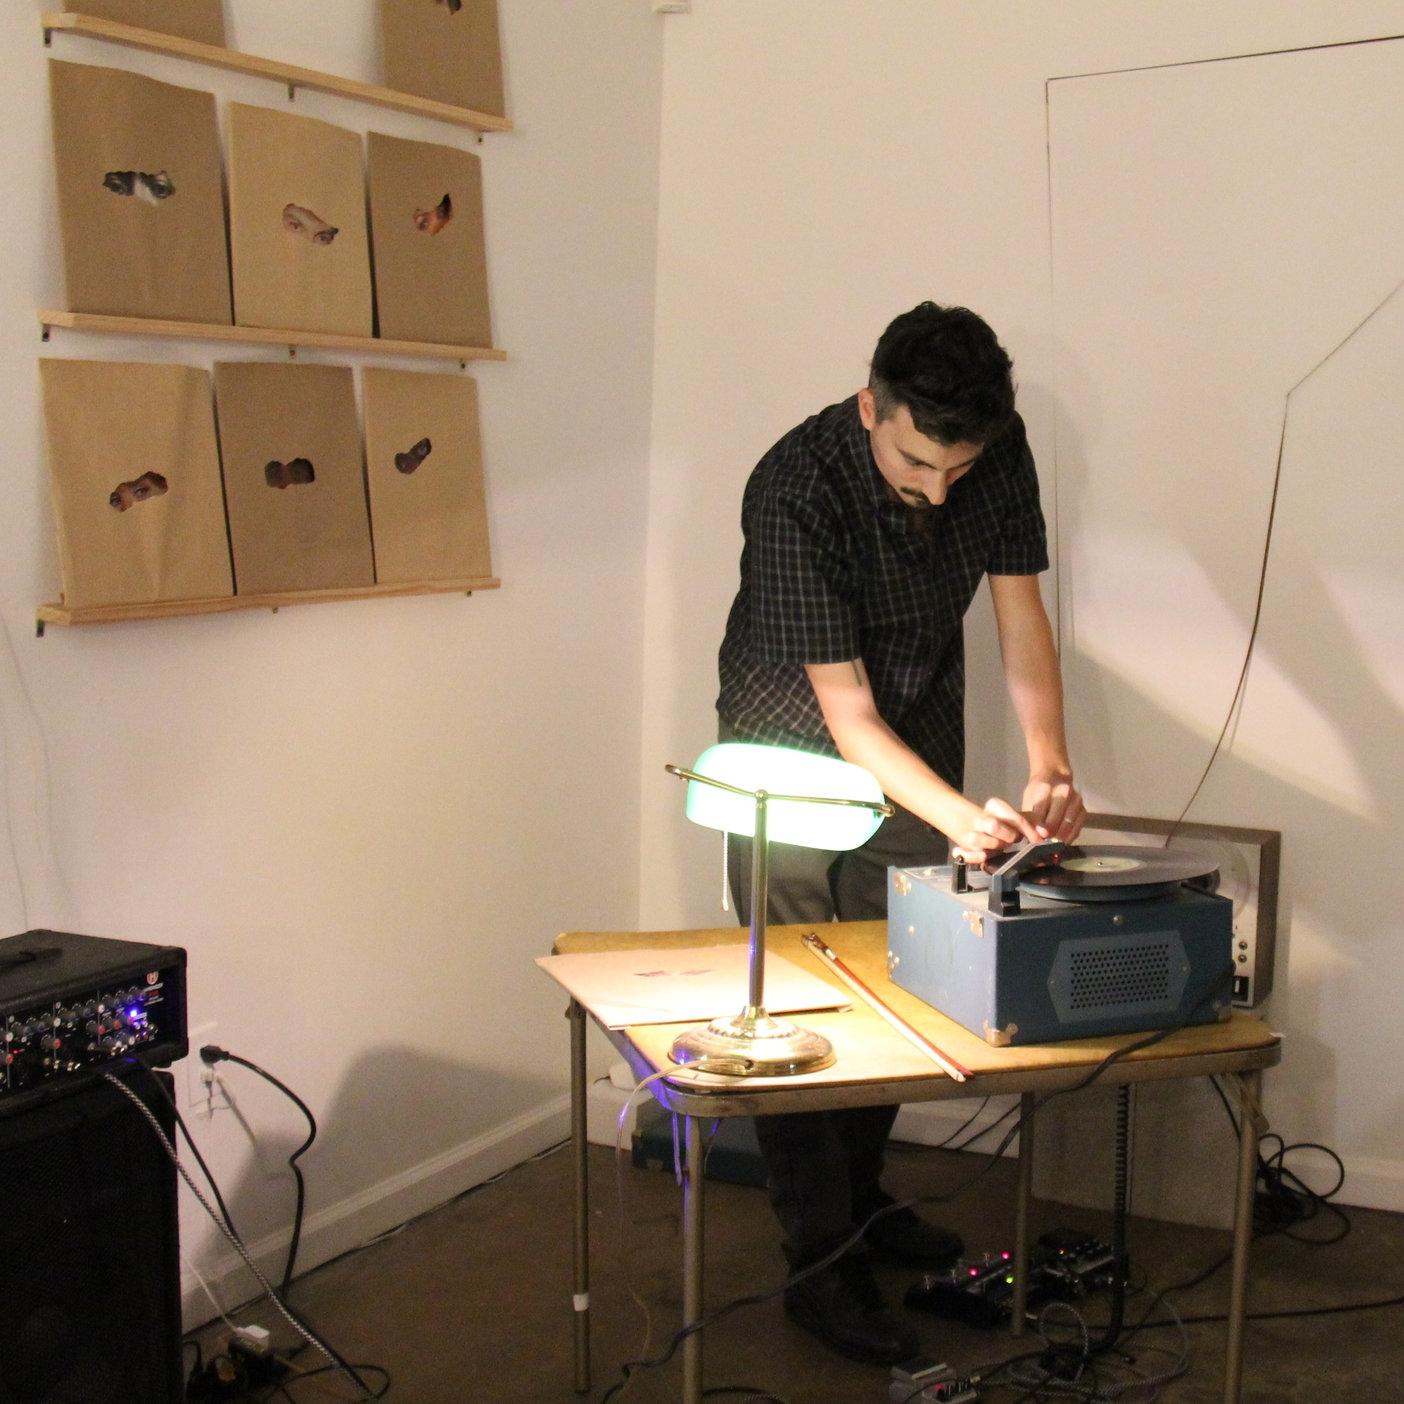 RICHARD VERGEZ  Residency: SEPTEMBER 2018 Events:  EXHIBITION  / PERFORMANCE / ARTIST TALK  WEBSITE